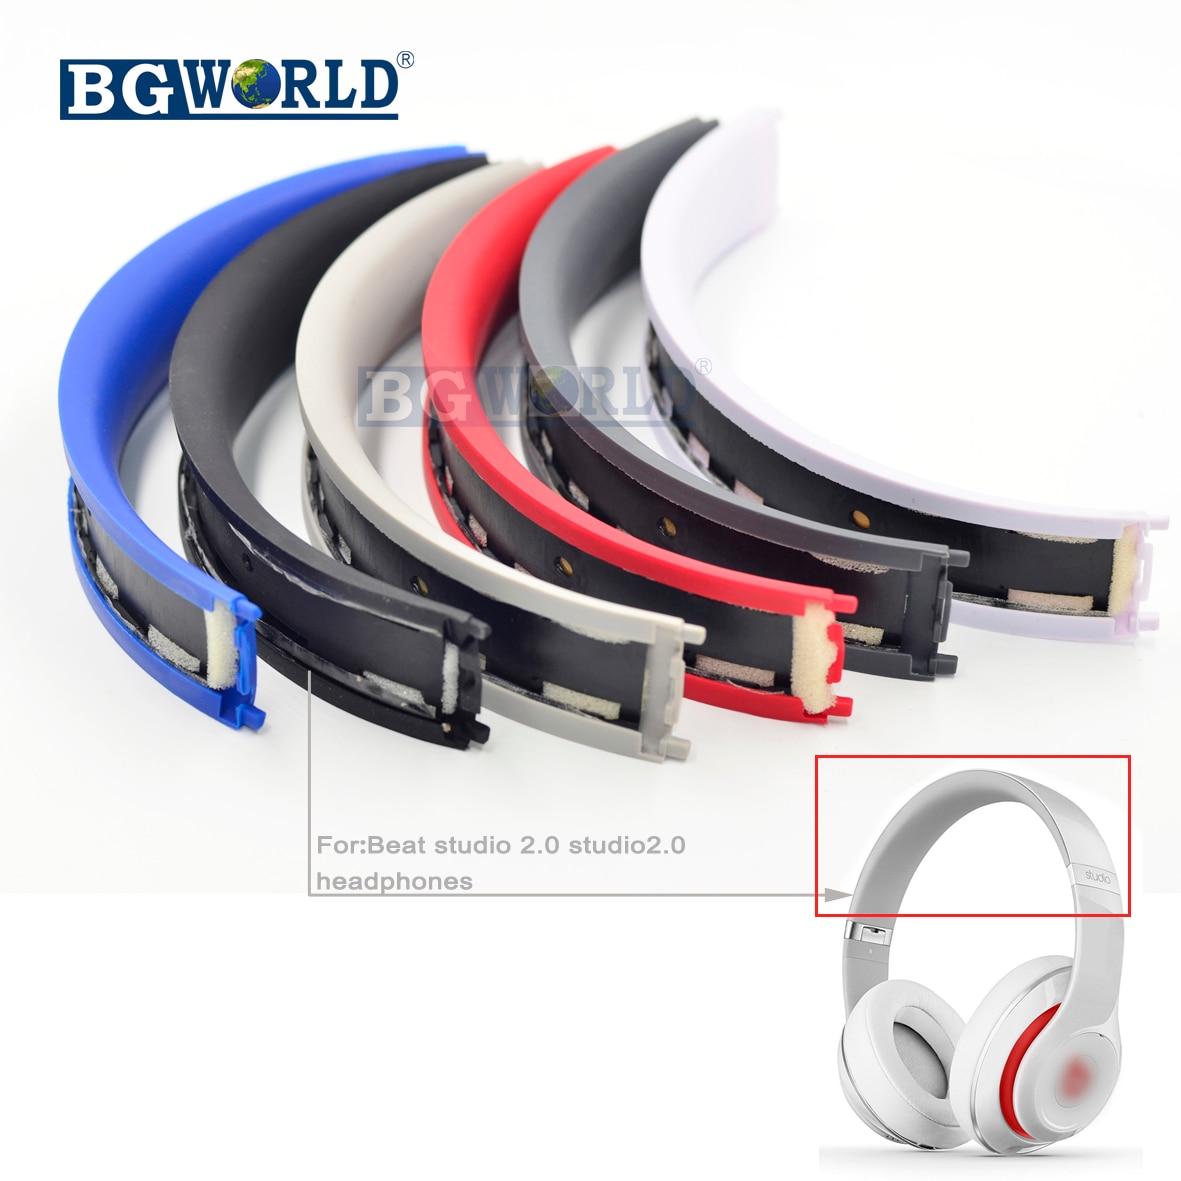 New Top headband head band bands parts for studio2.0 studio 2.0 headphones